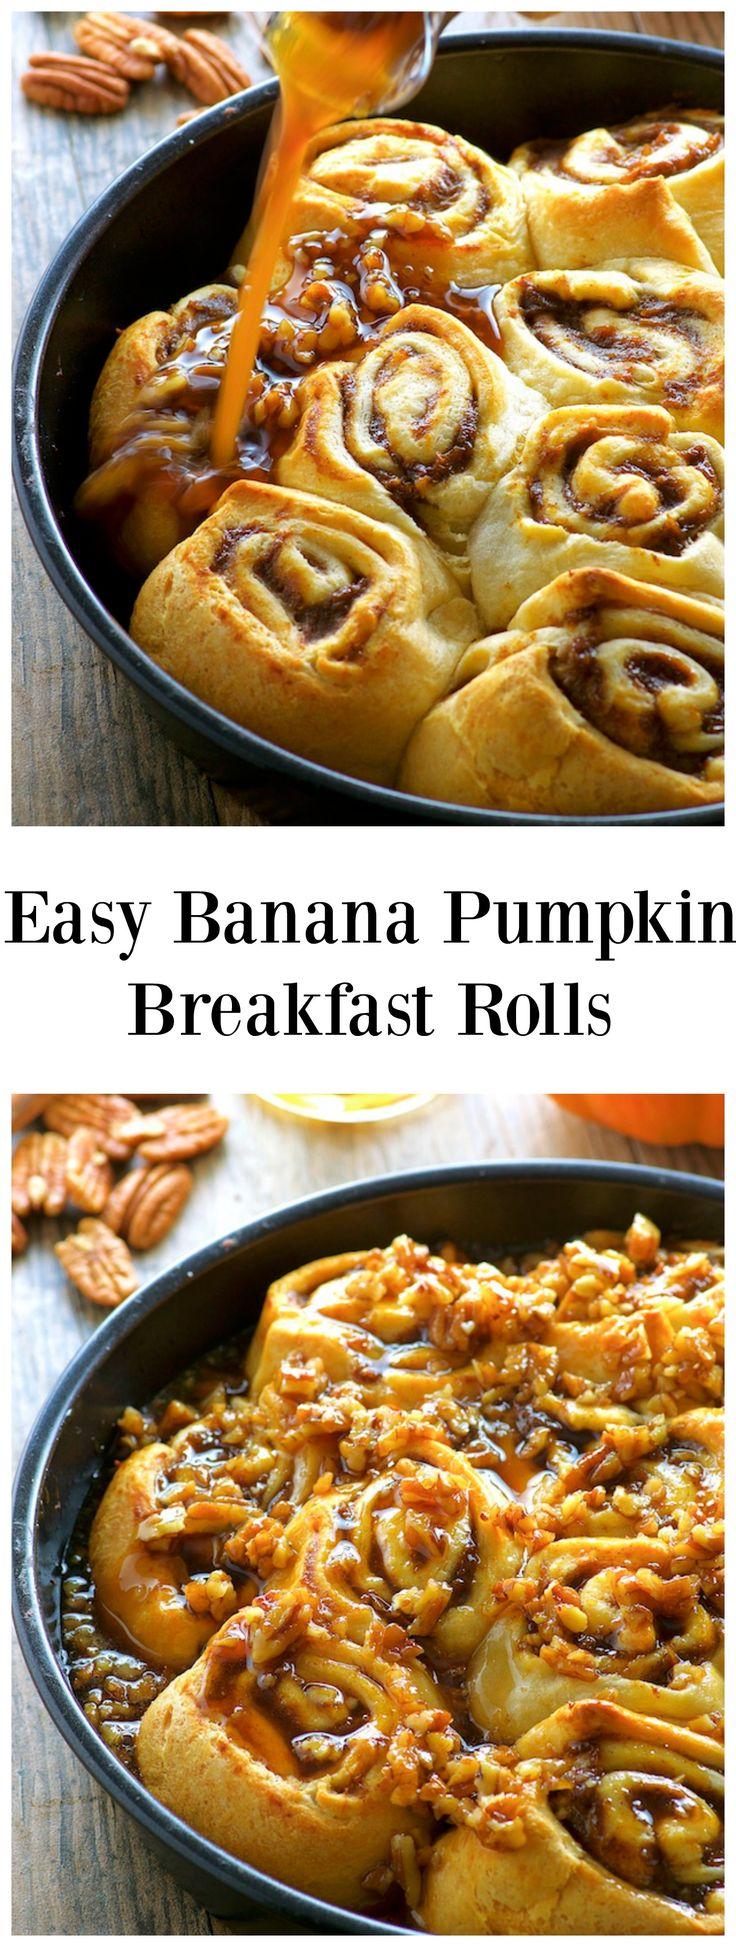 Easy Banana Pumpkin Breakfast Rolls